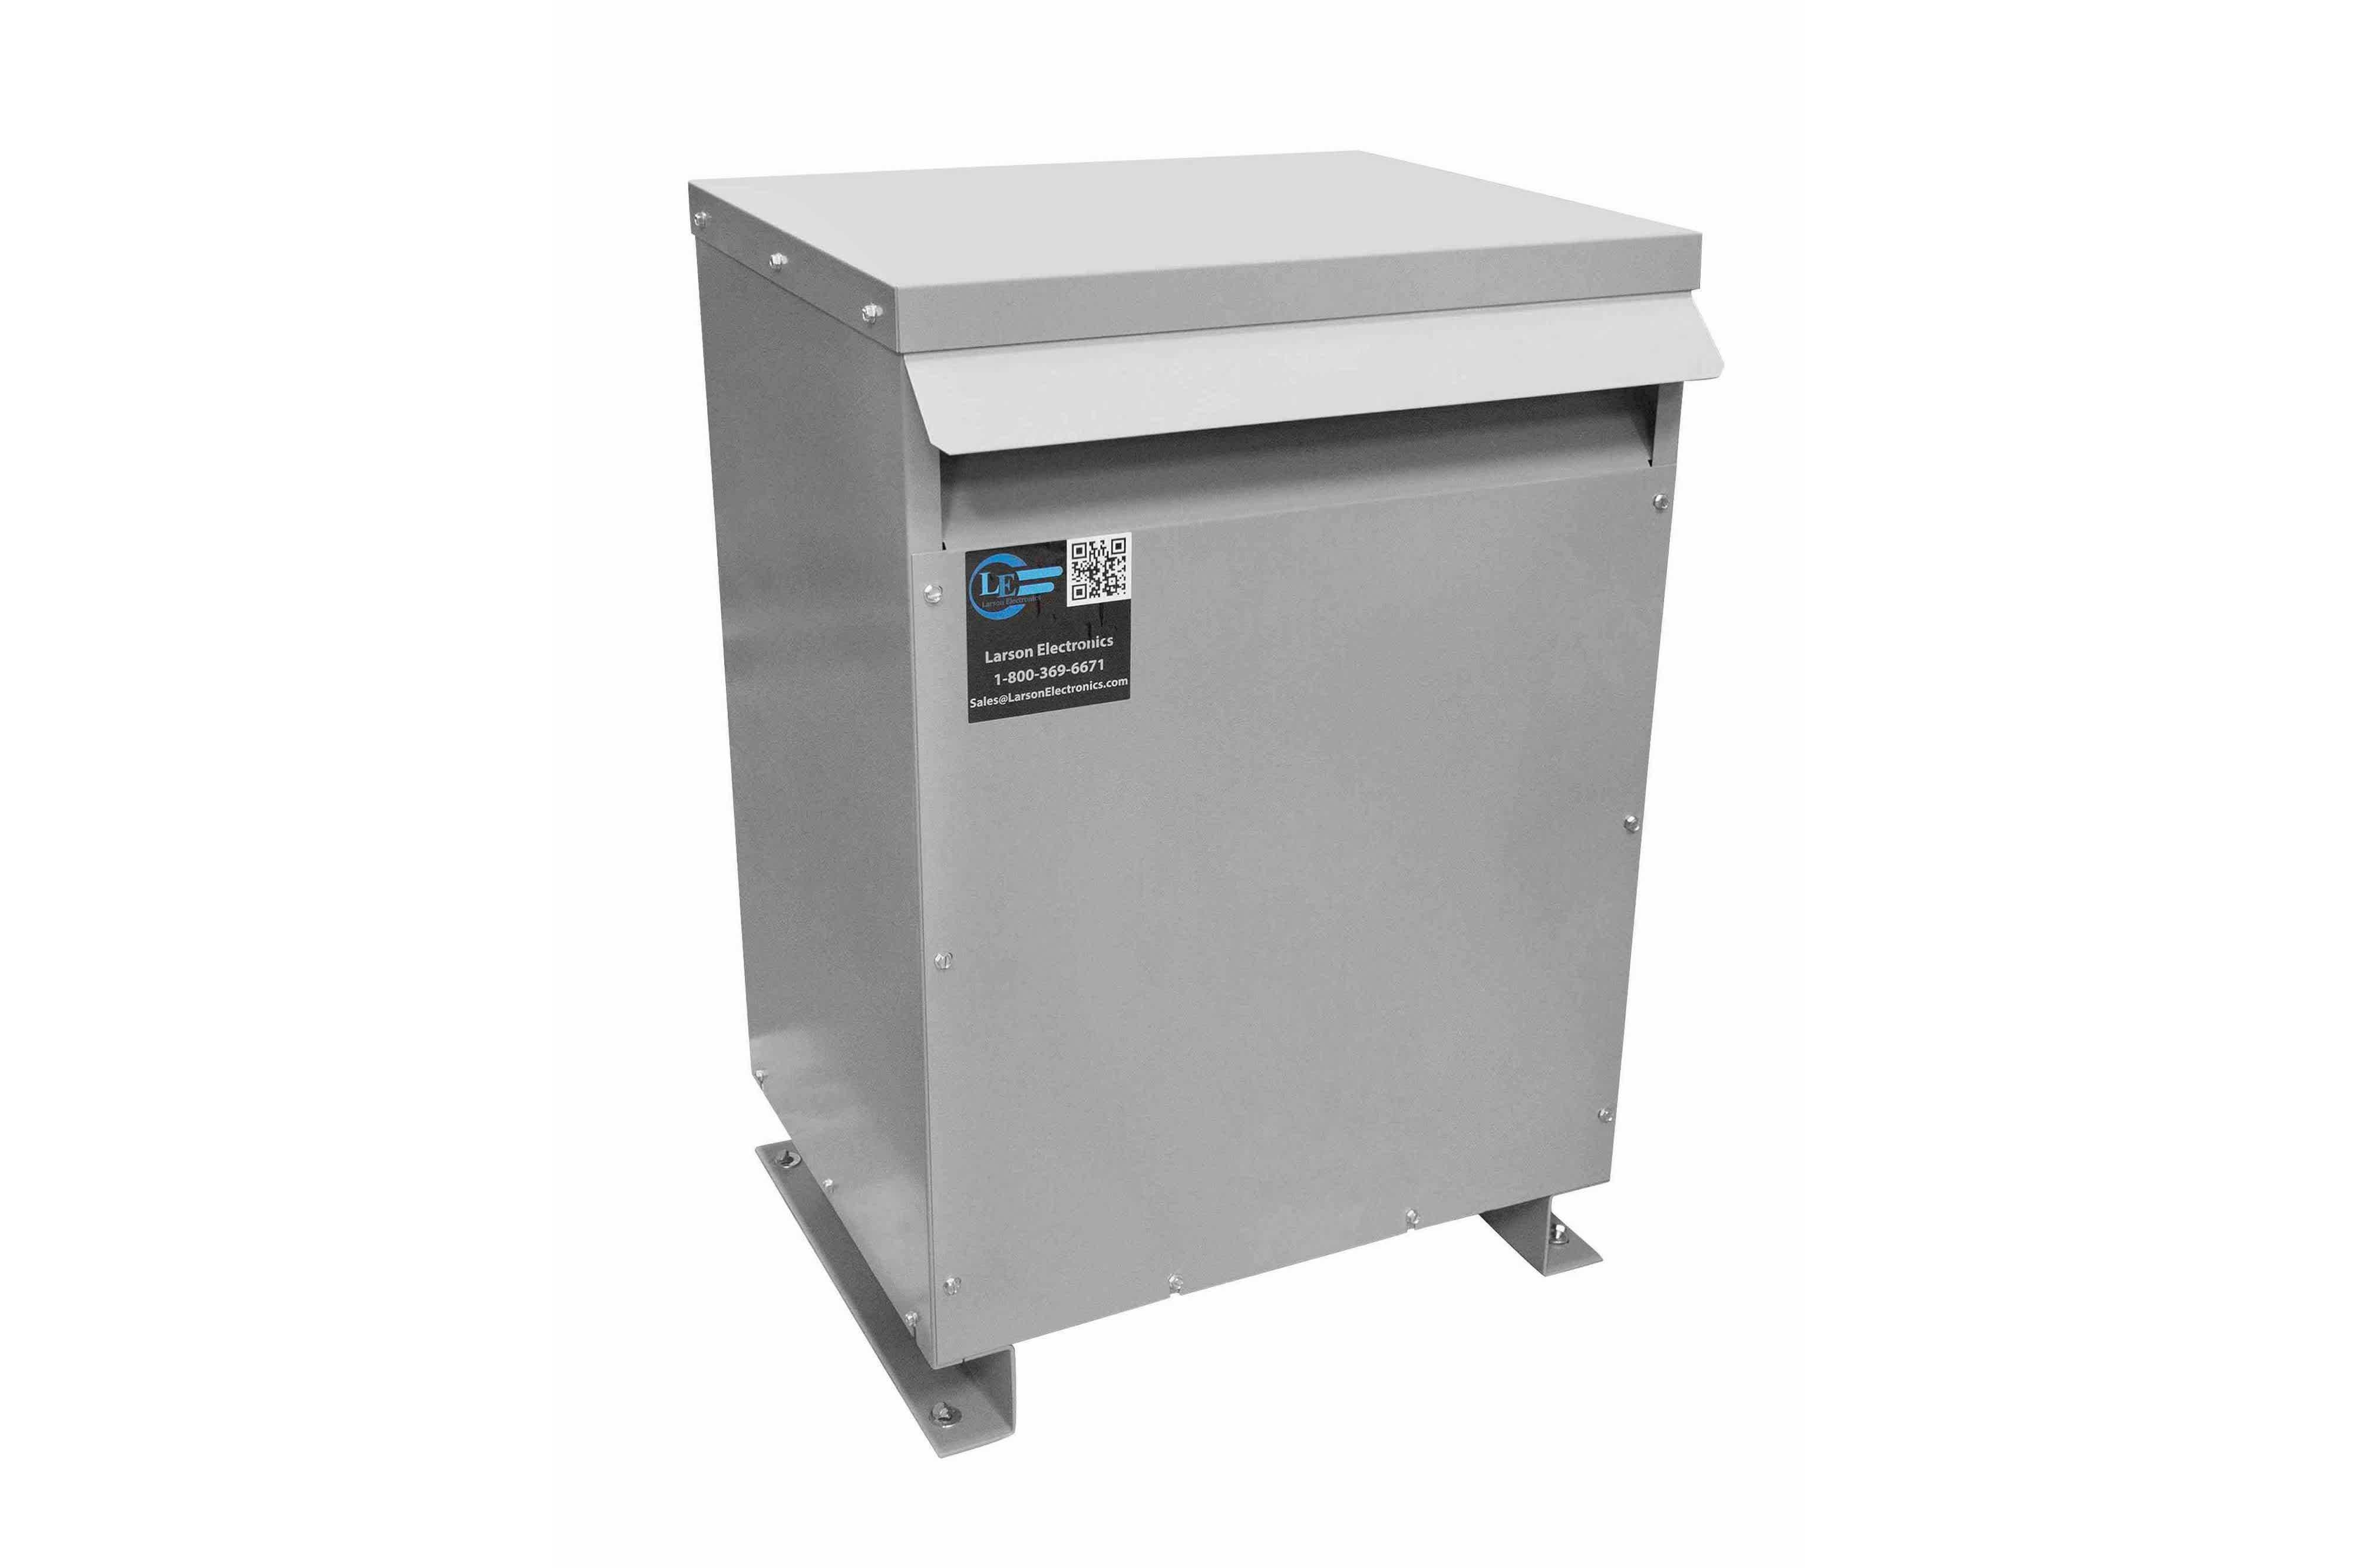 225 kVA 3PH Isolation Transformer, 575V Wye Primary, 240V Delta Secondary, N3R, Ventilated, 60 Hz